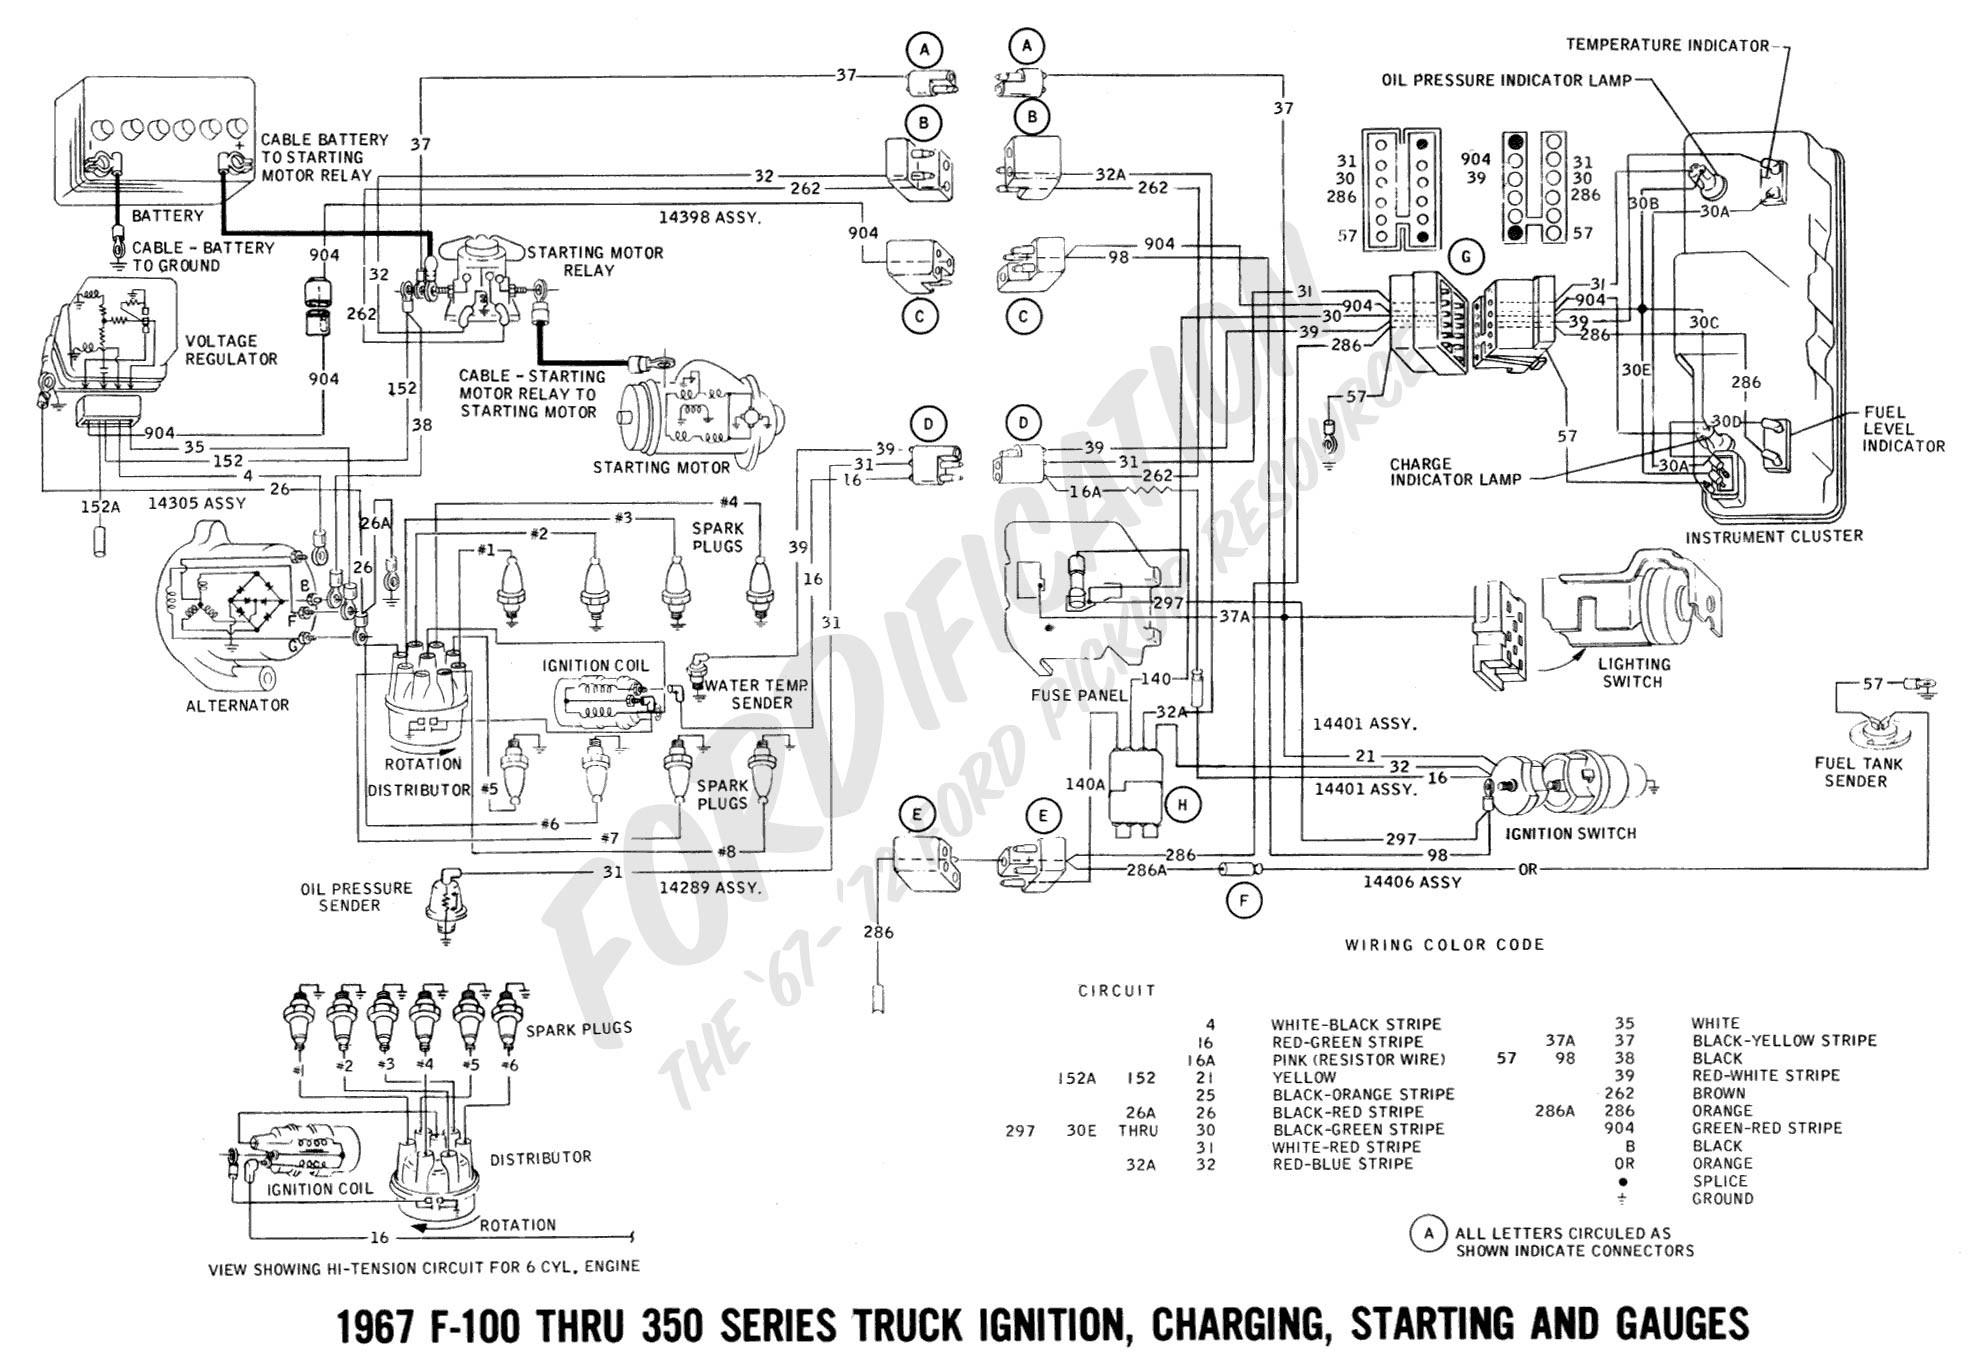 68 ford fuse box diagram